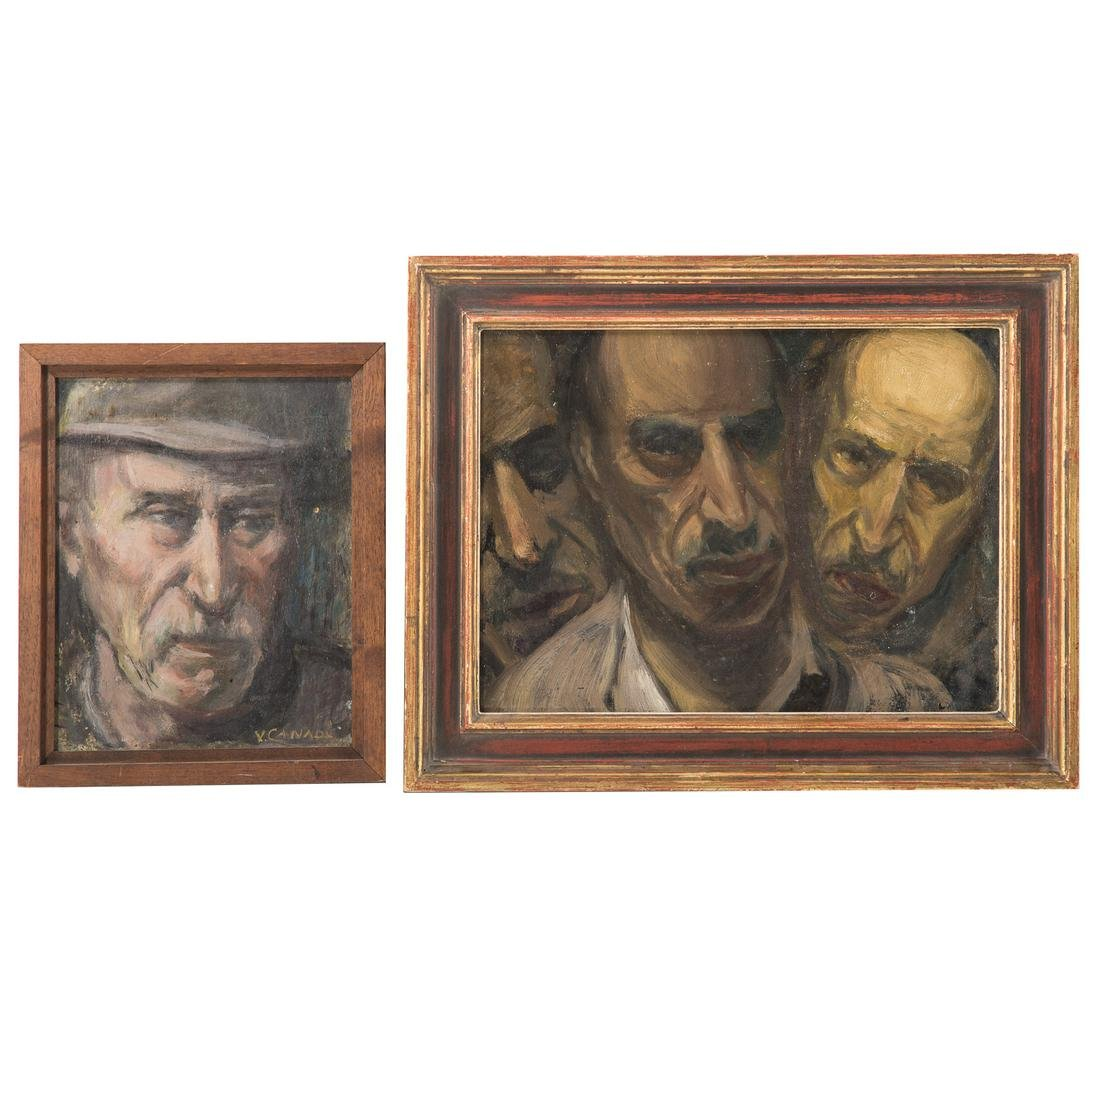 Vincent Canade. Two Self Portraits